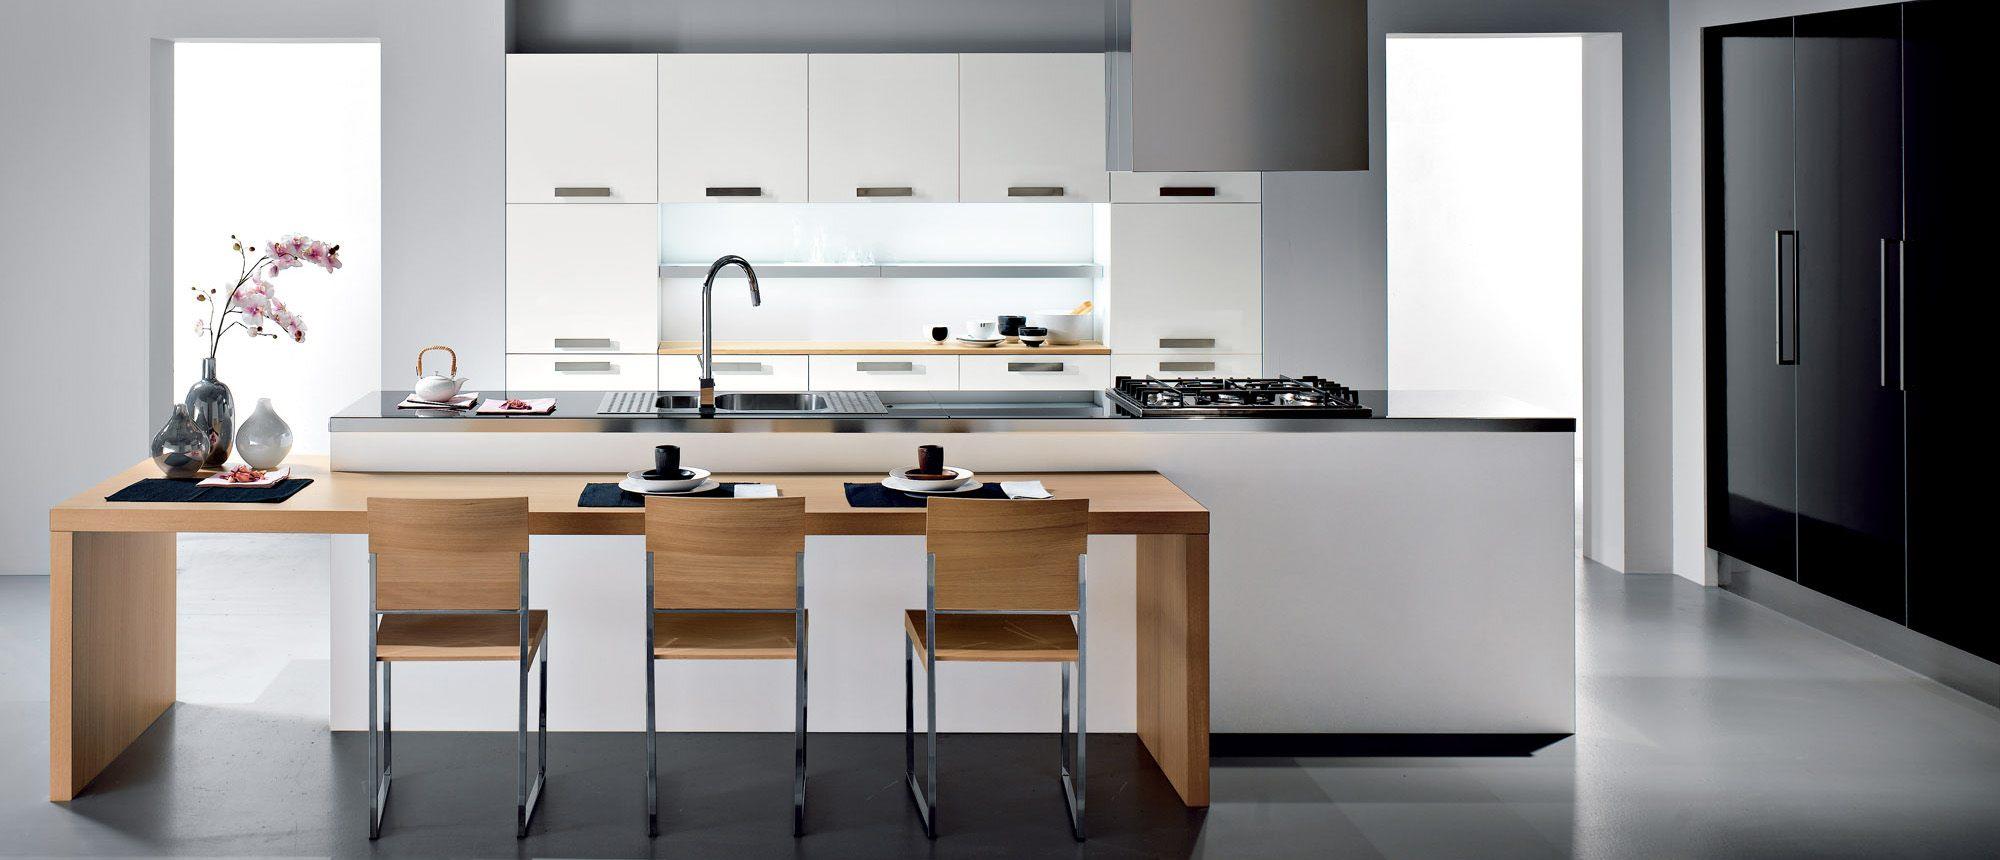 Arredamenti mobili de pianto - Arredo tre cucine ...